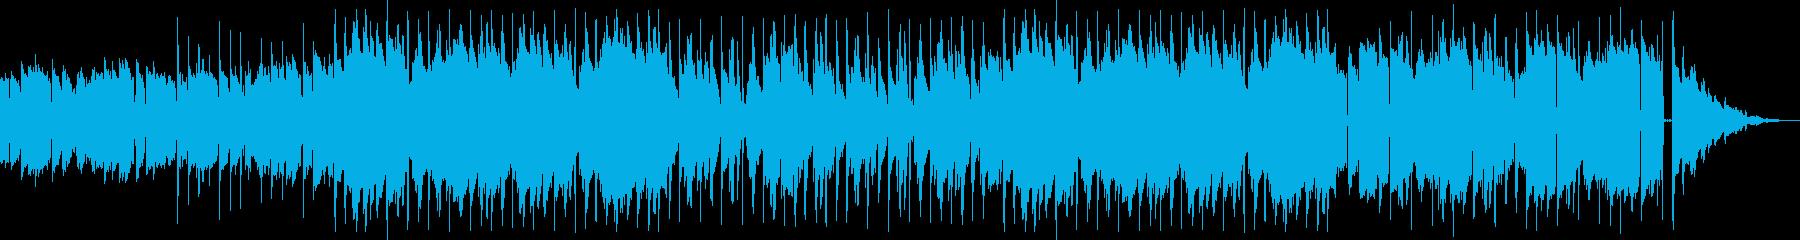 lo-fi hip-hop9の再生済みの波形